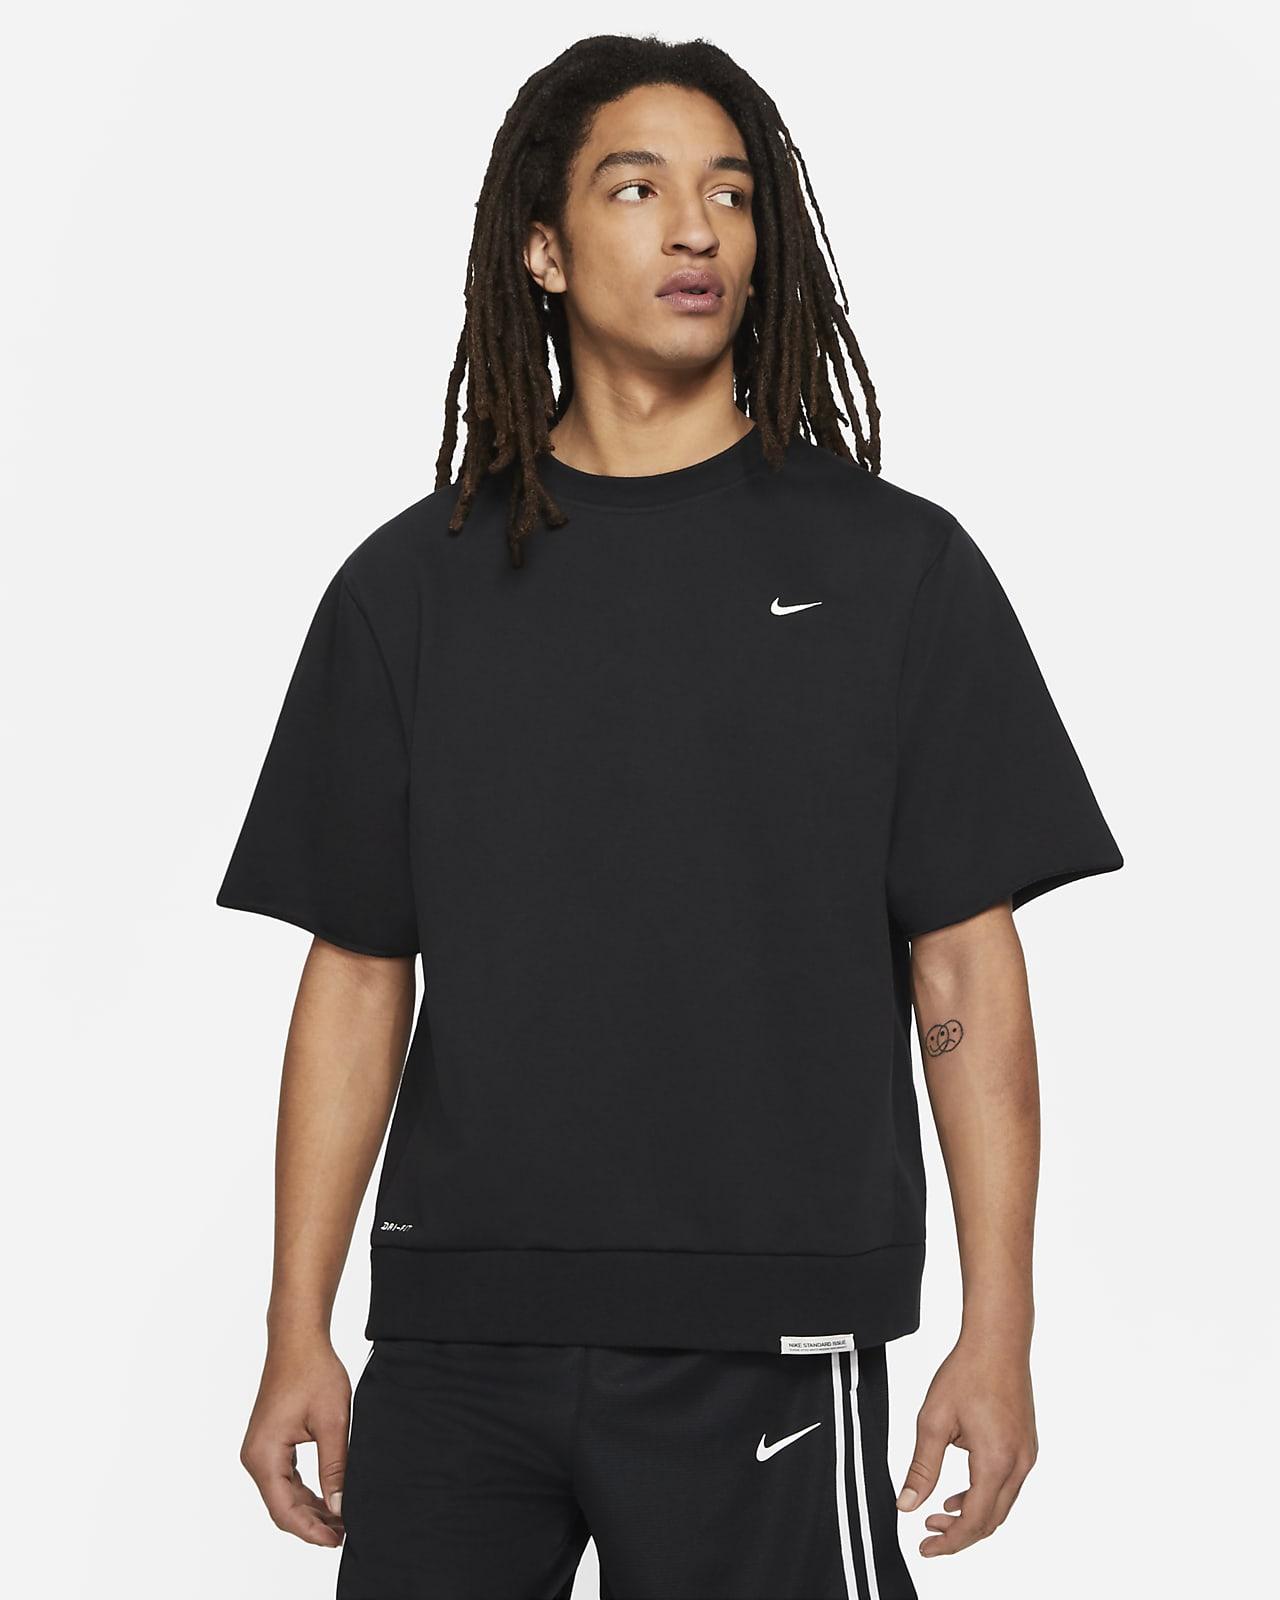 Prenda para la parte superior recortada de básquetbol para hombre Nike Dri-FIT Standard Issue